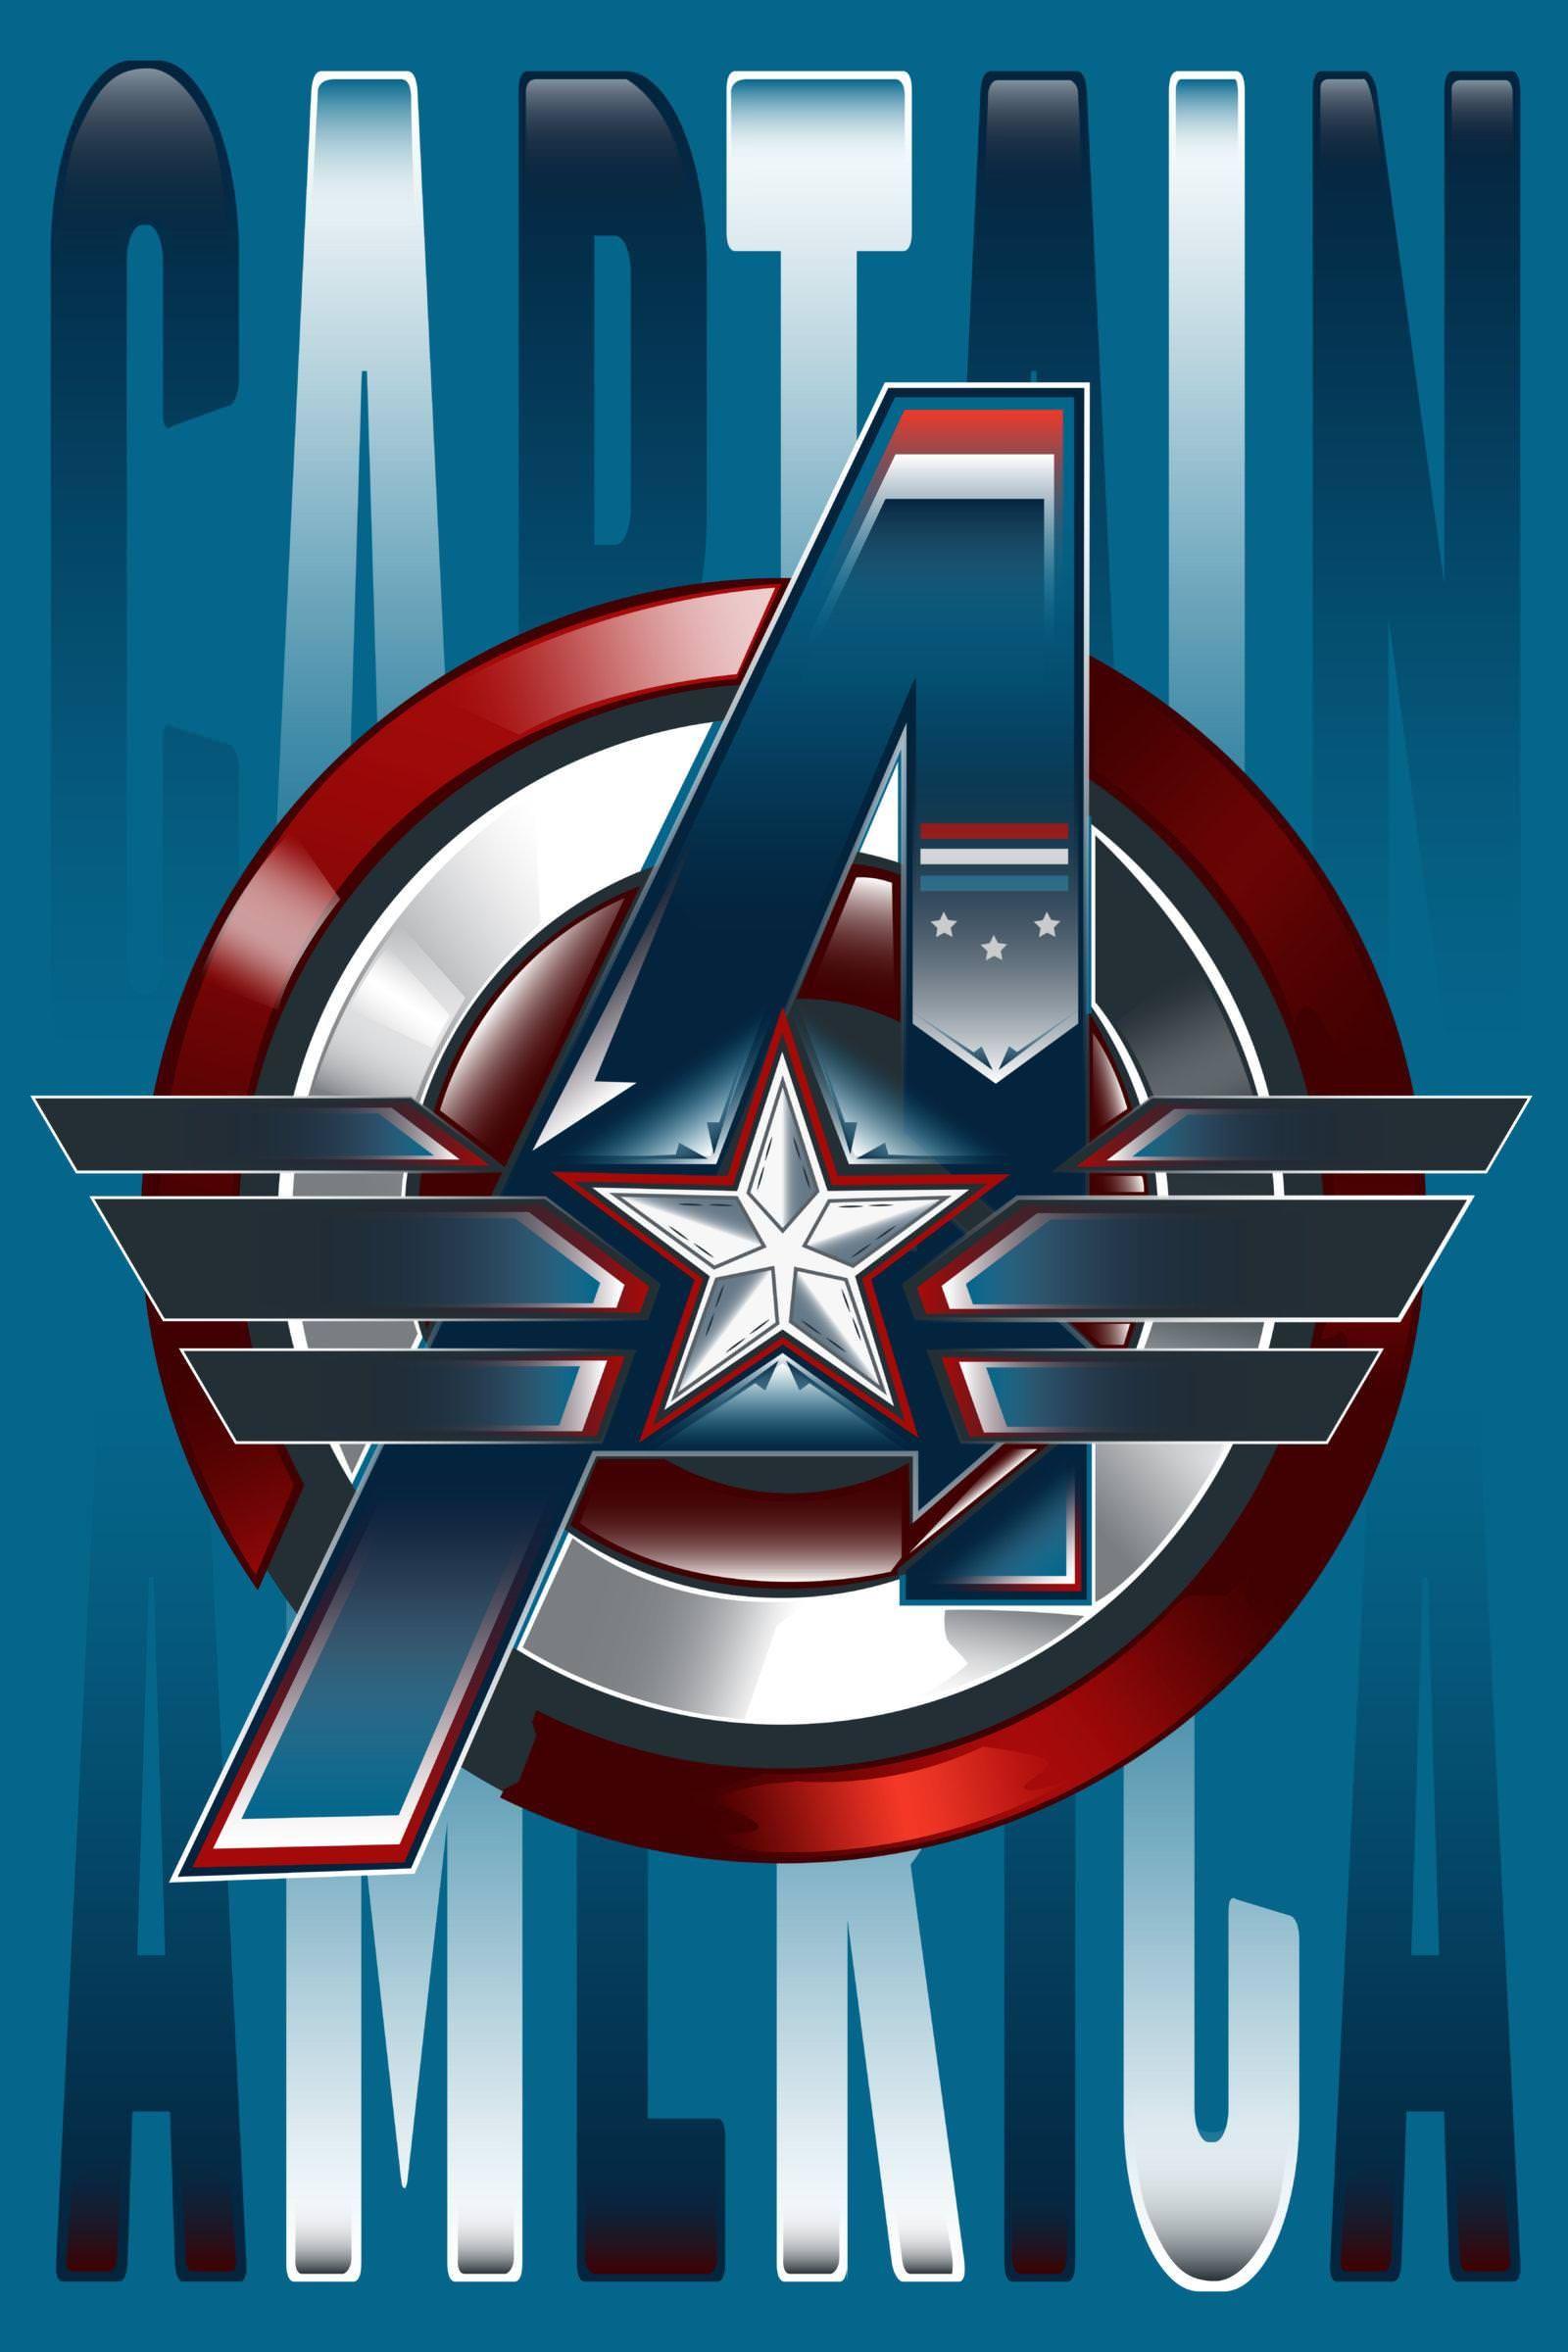 Captain America \u0026 Iron Man posters by Sam Harachis マーベル映画, ハルク, キャプテンアメリカ